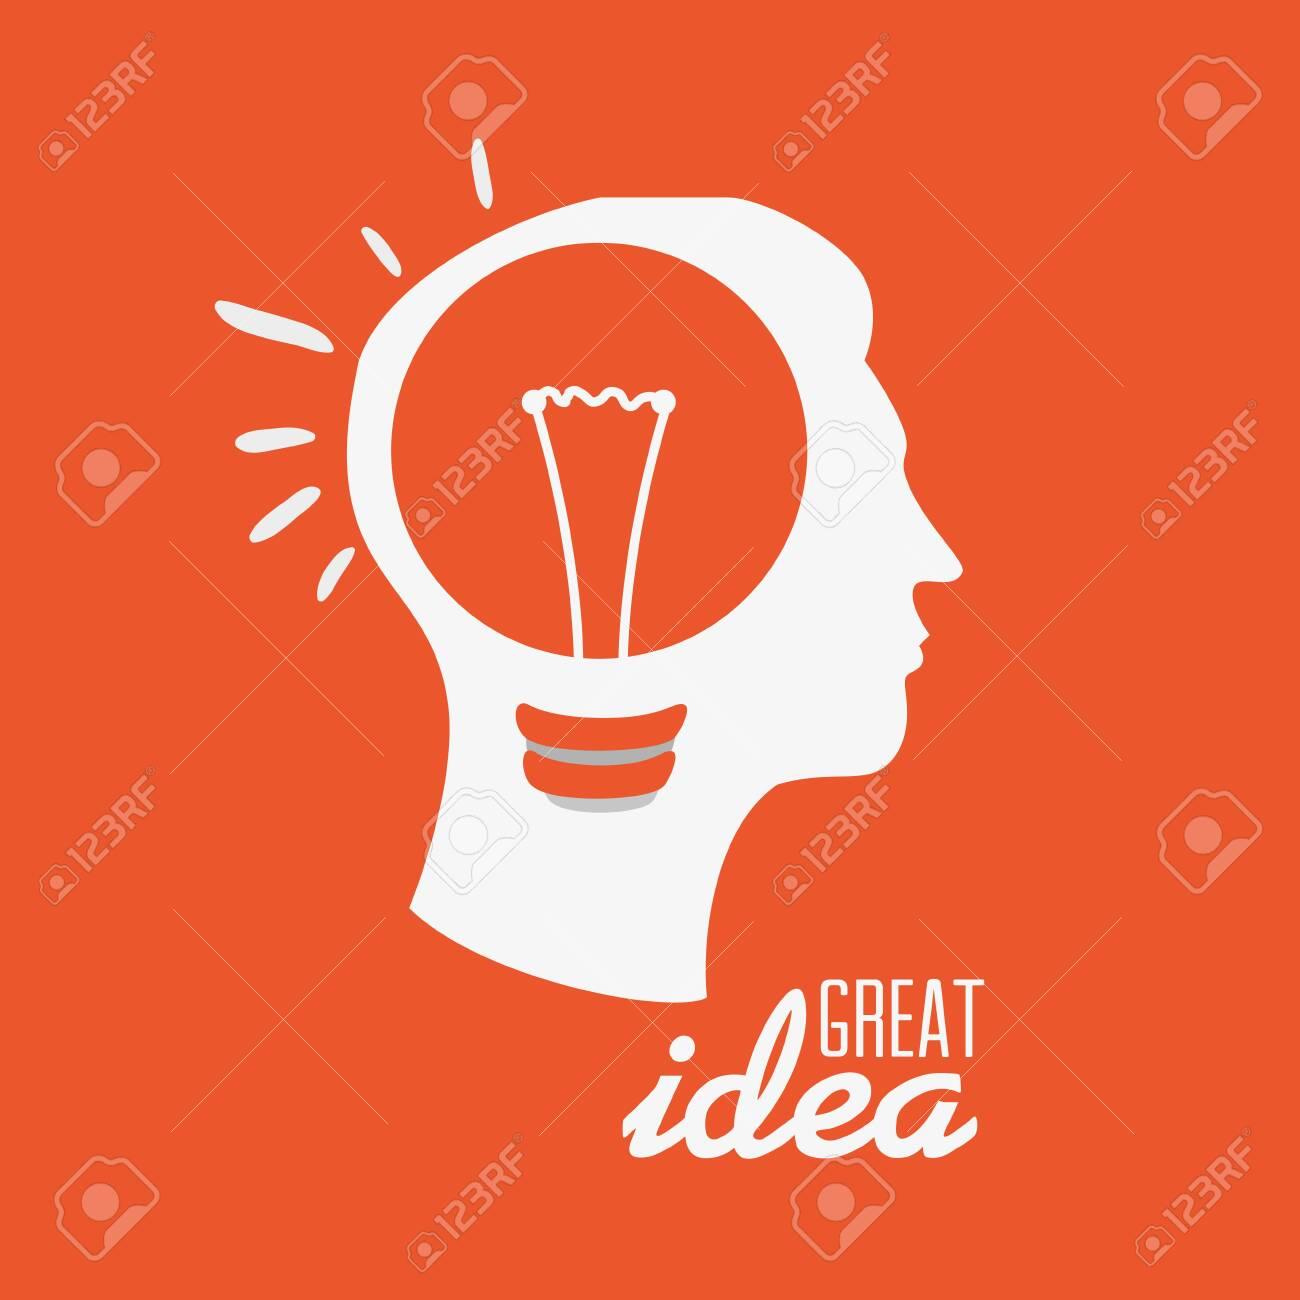 Idea design over orange background, vector illustration. - 133839430